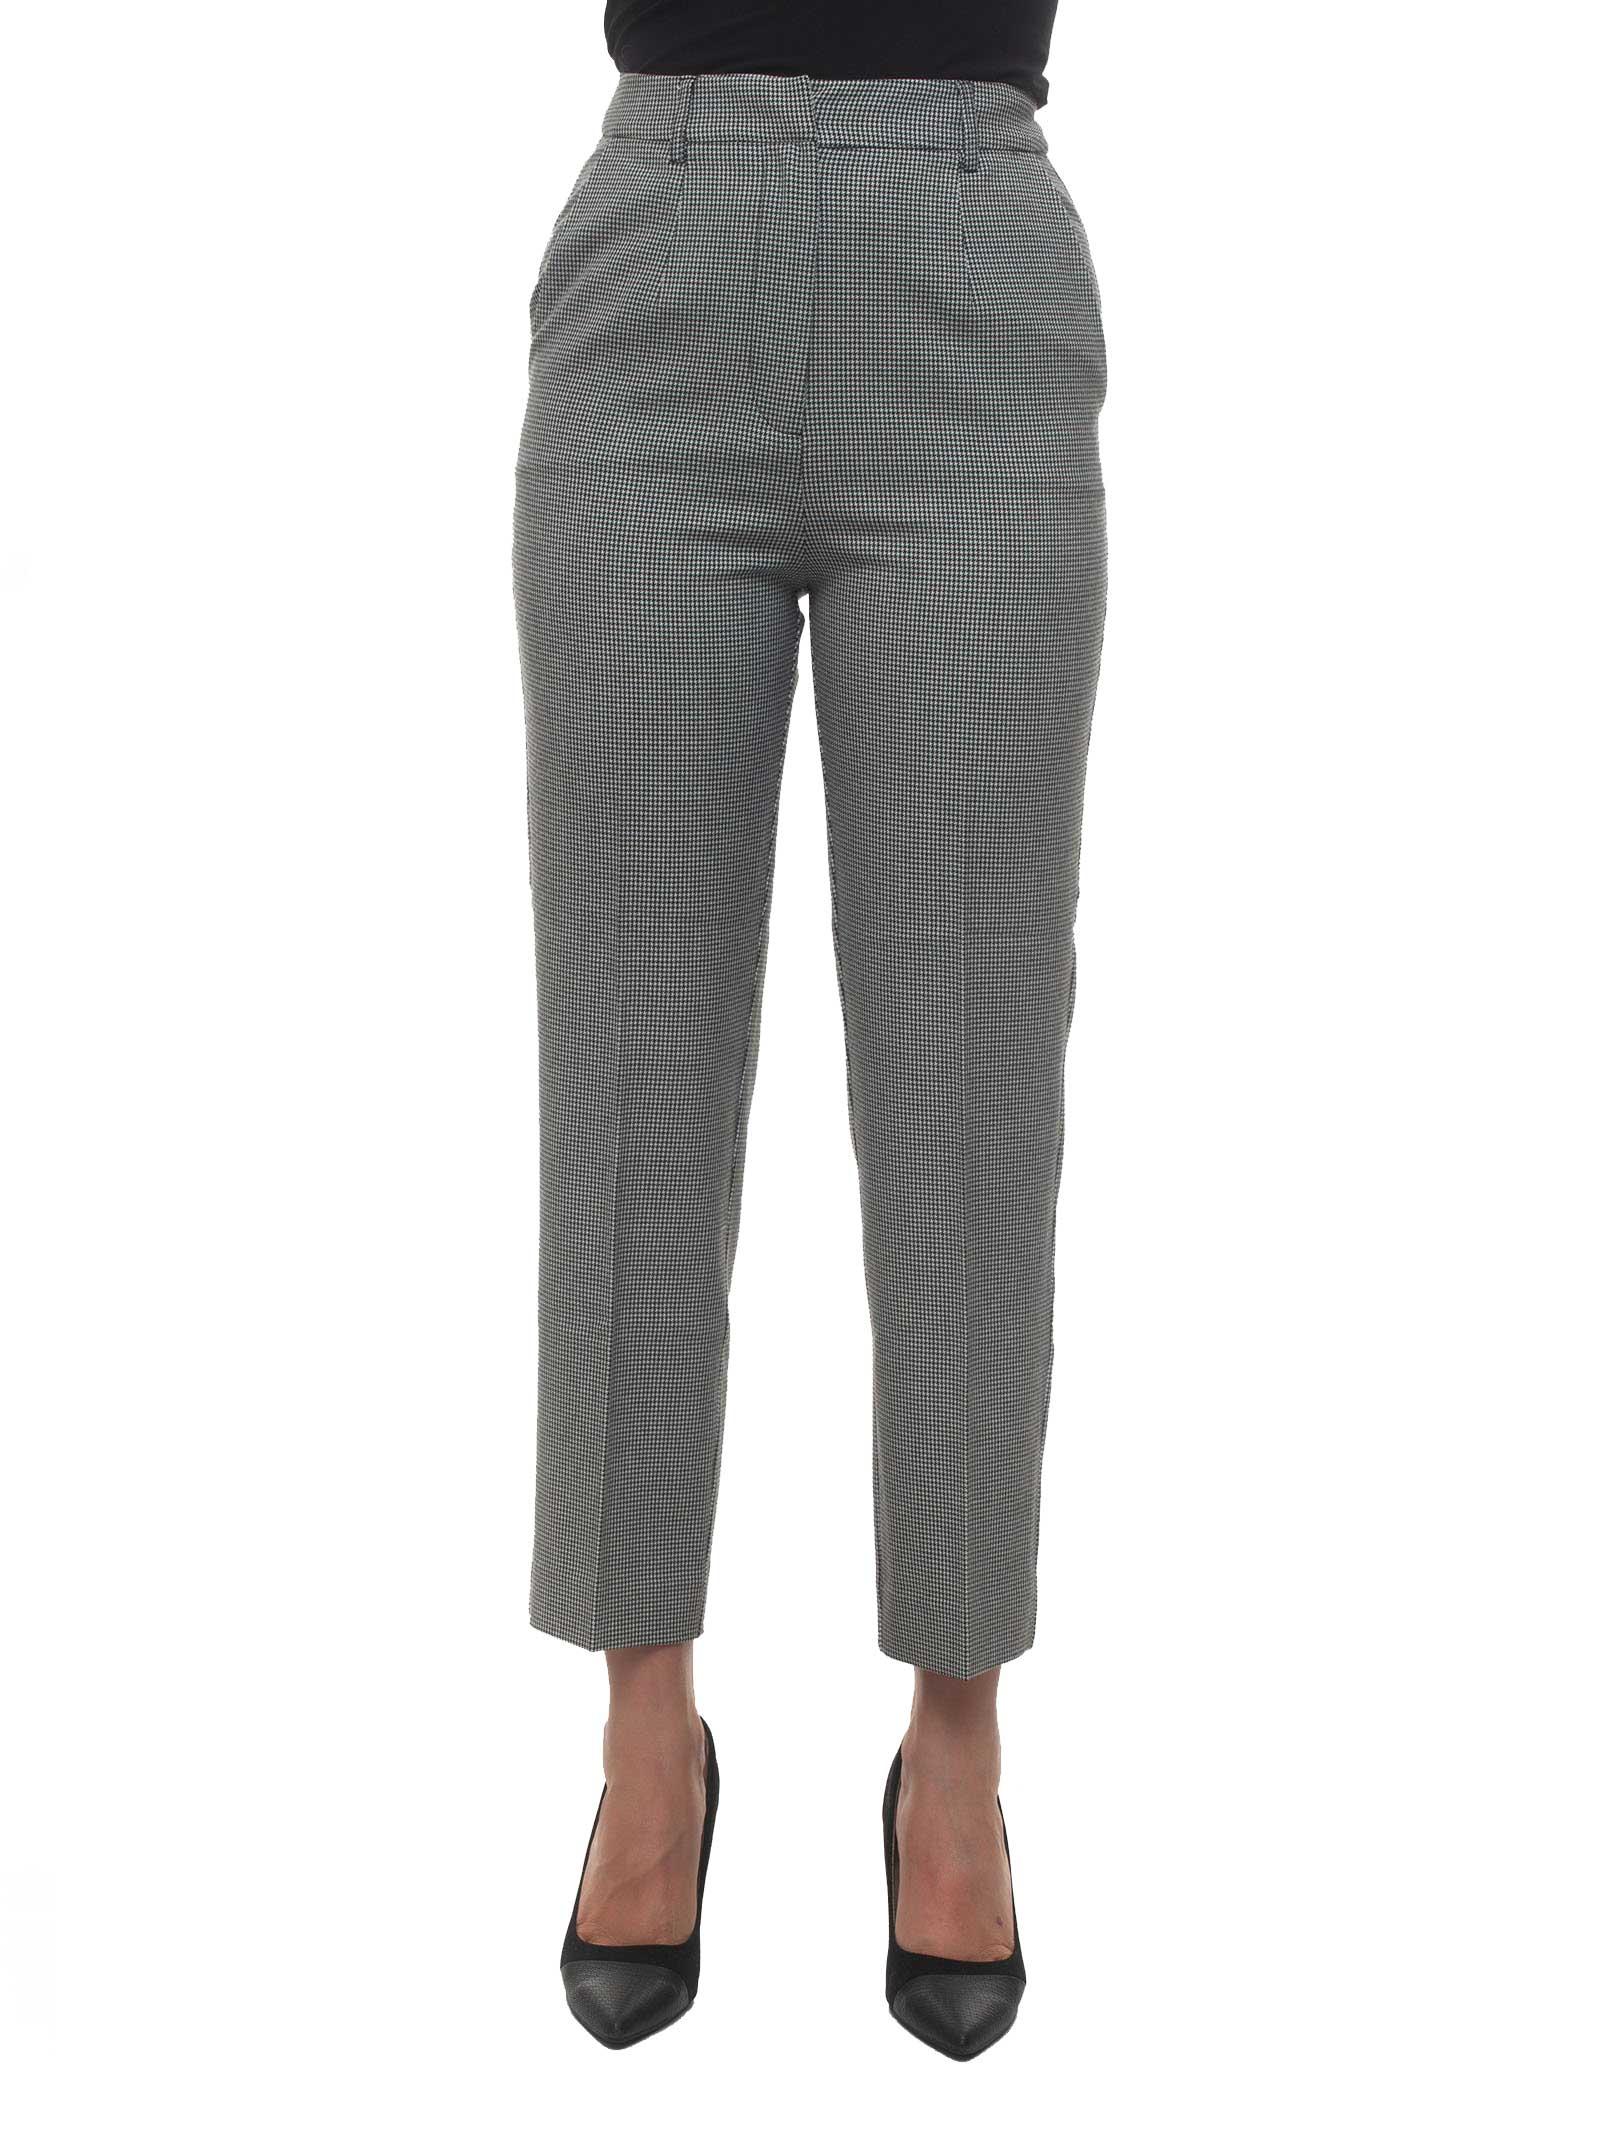 PANTALONI GUESS GUESS   Pantalone   W0BB78-WAOH0FN90